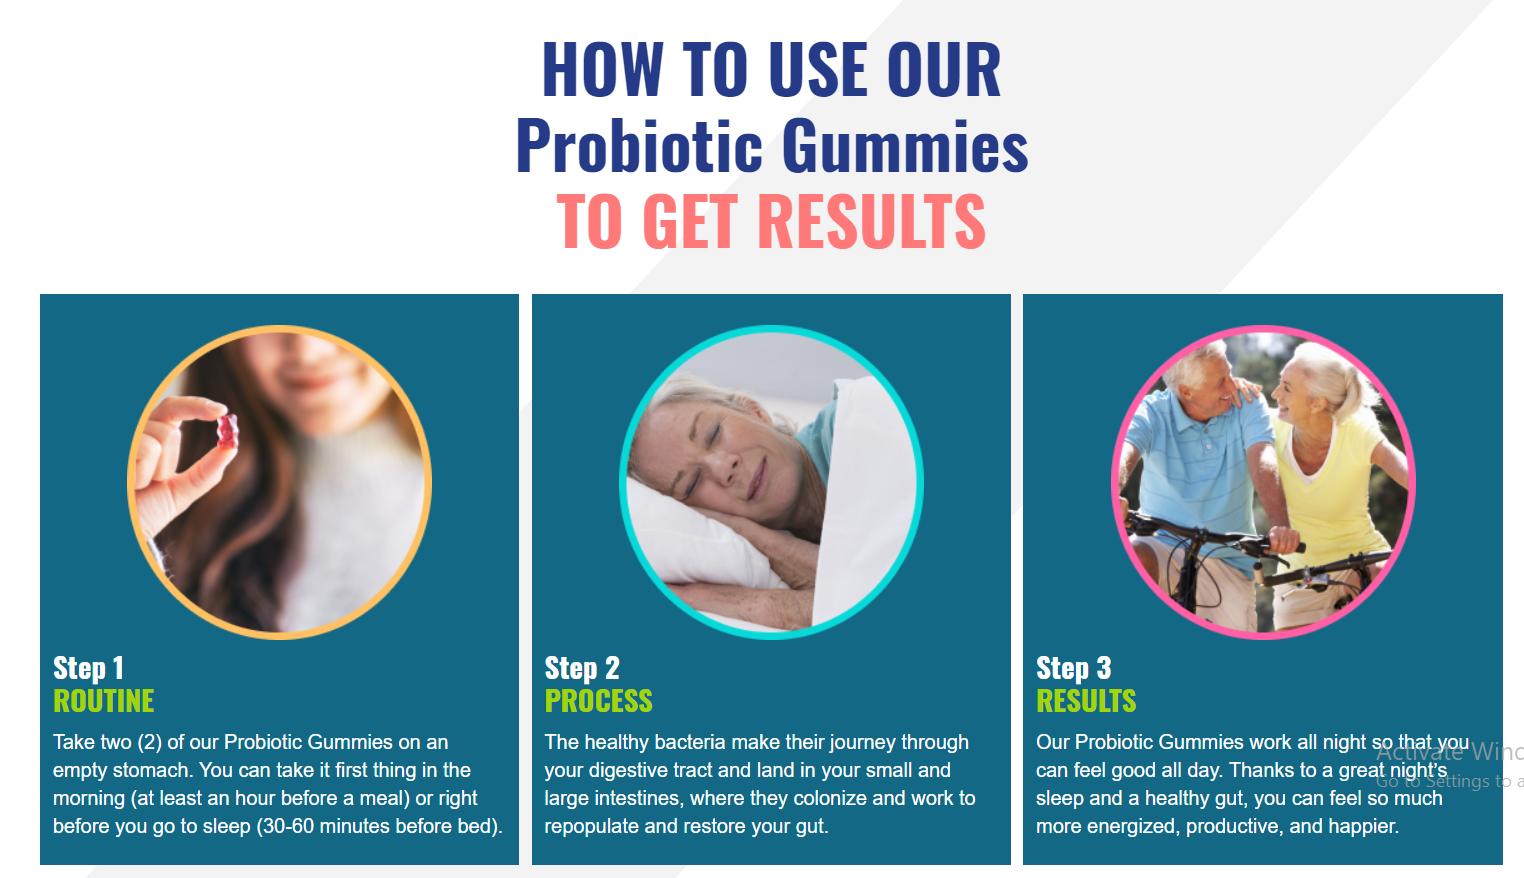 https://www.onlinepill.shop/Nutra-Empire-Probiotic-Gummies